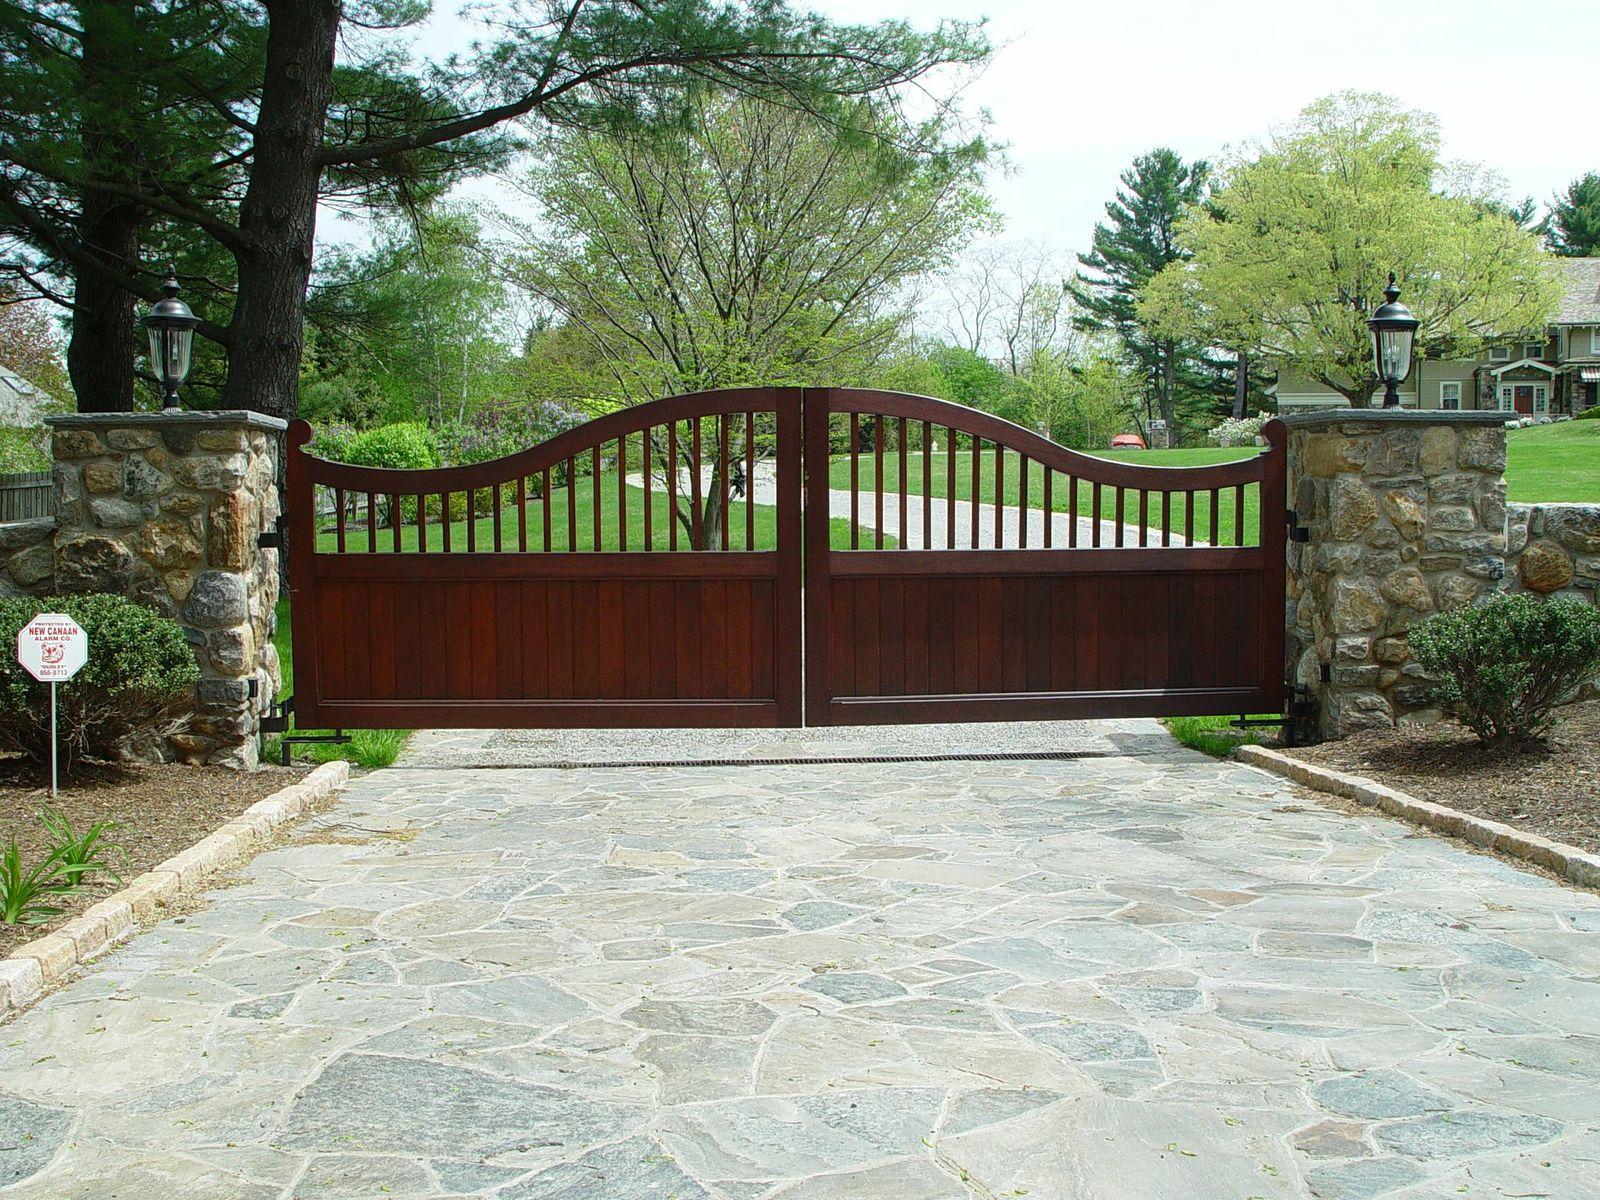 Mahogany double-swing automatic driveway gate